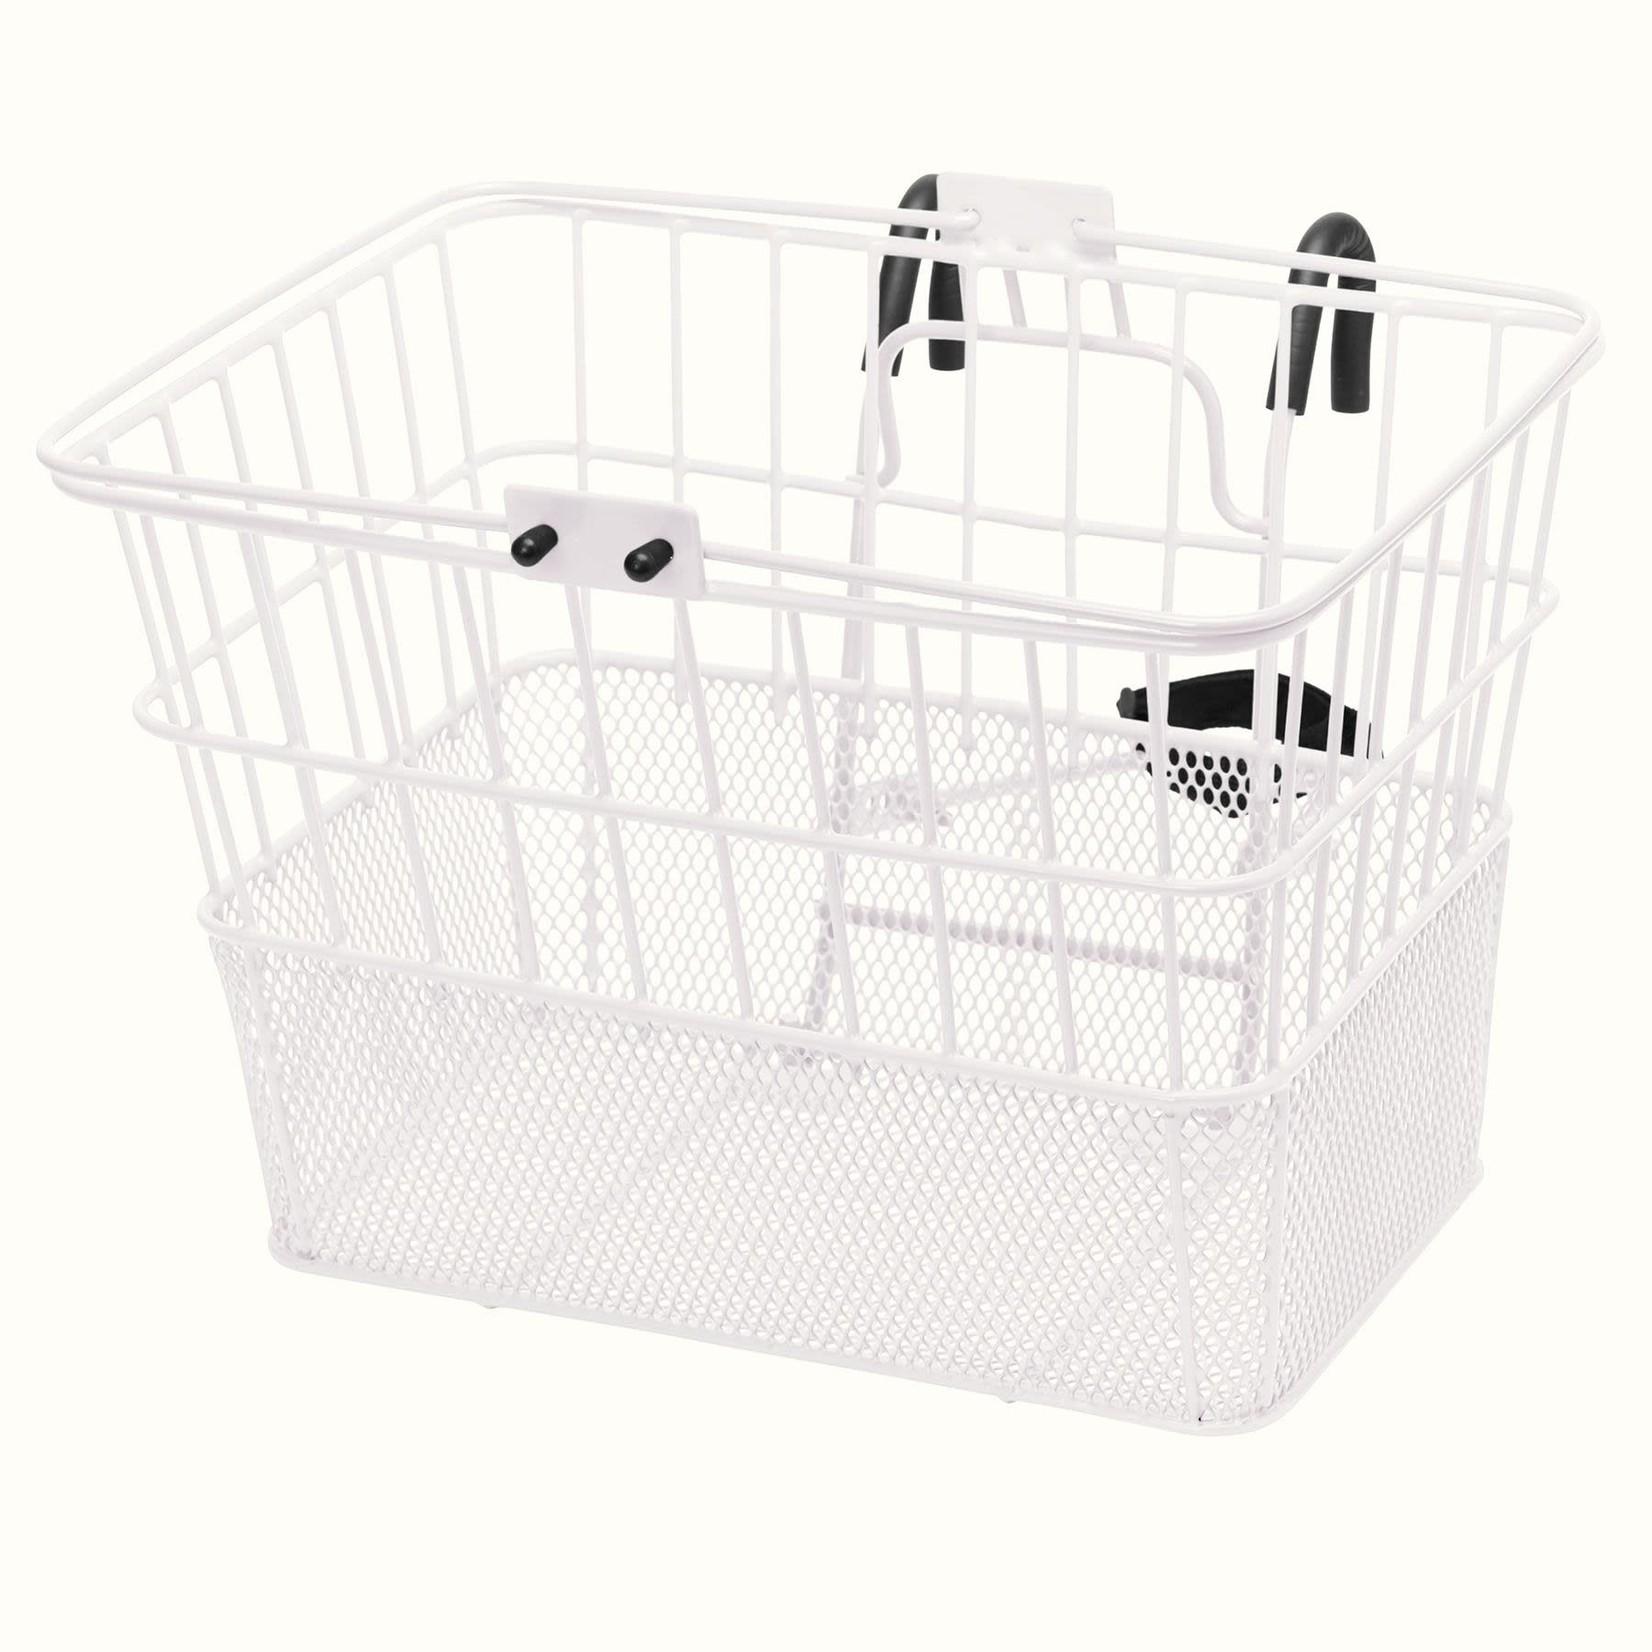 Retrospec Retrospec Apollo Basket White